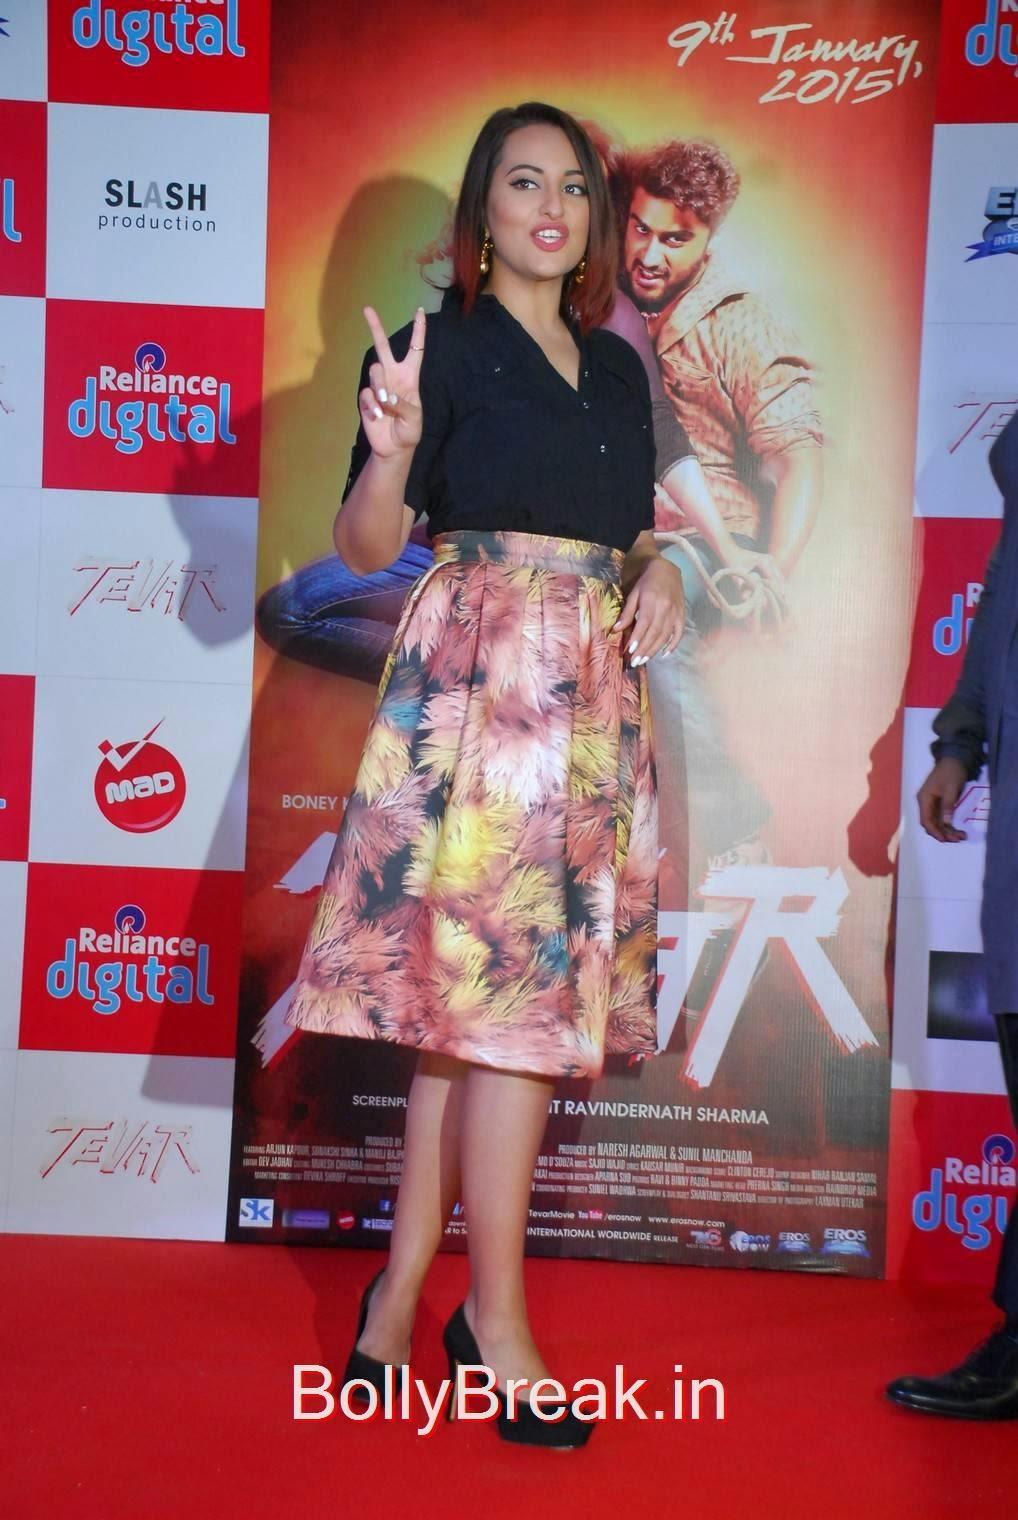 Sonakshi Sinha Stills, Sonakshi Sinha Hot Pics In Skirt At Reliance Digital Infiniti Mall 2 Malad